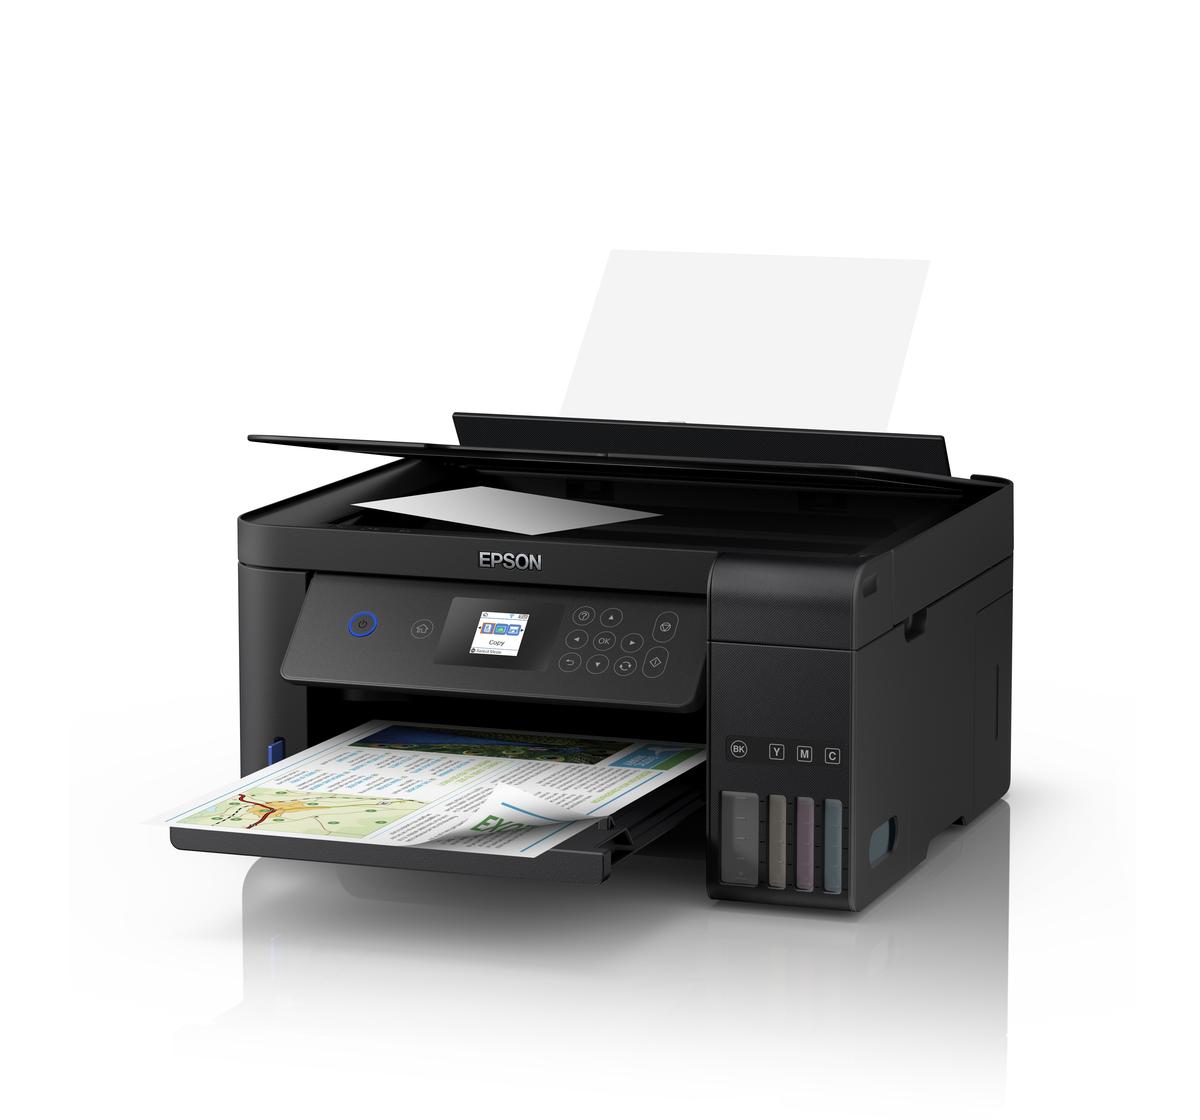 Epson L4160 Wi Fi Duplex All In One Ink Tank Printer Ink